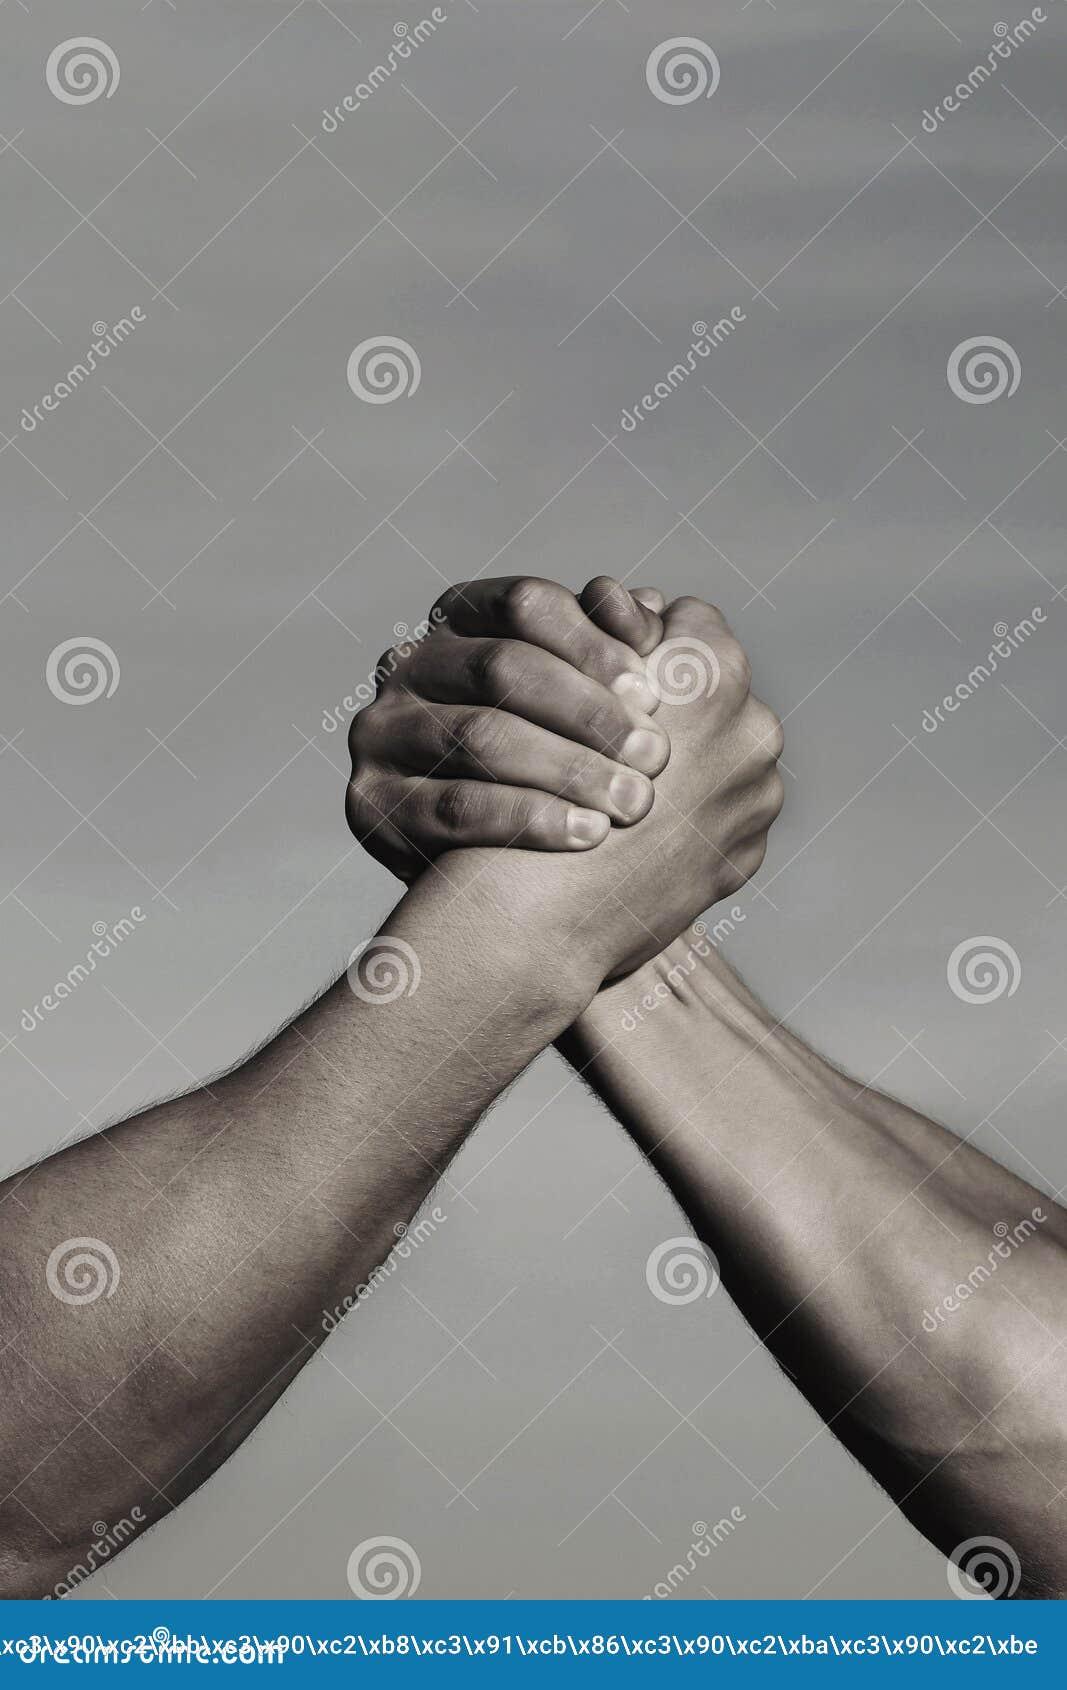 Rivalität, gegen, Herausforderung, Stärkevergleich Armringen mit zwei Männern Armringkampf, Wettbewerb Rivalitätskonzept - Abschl